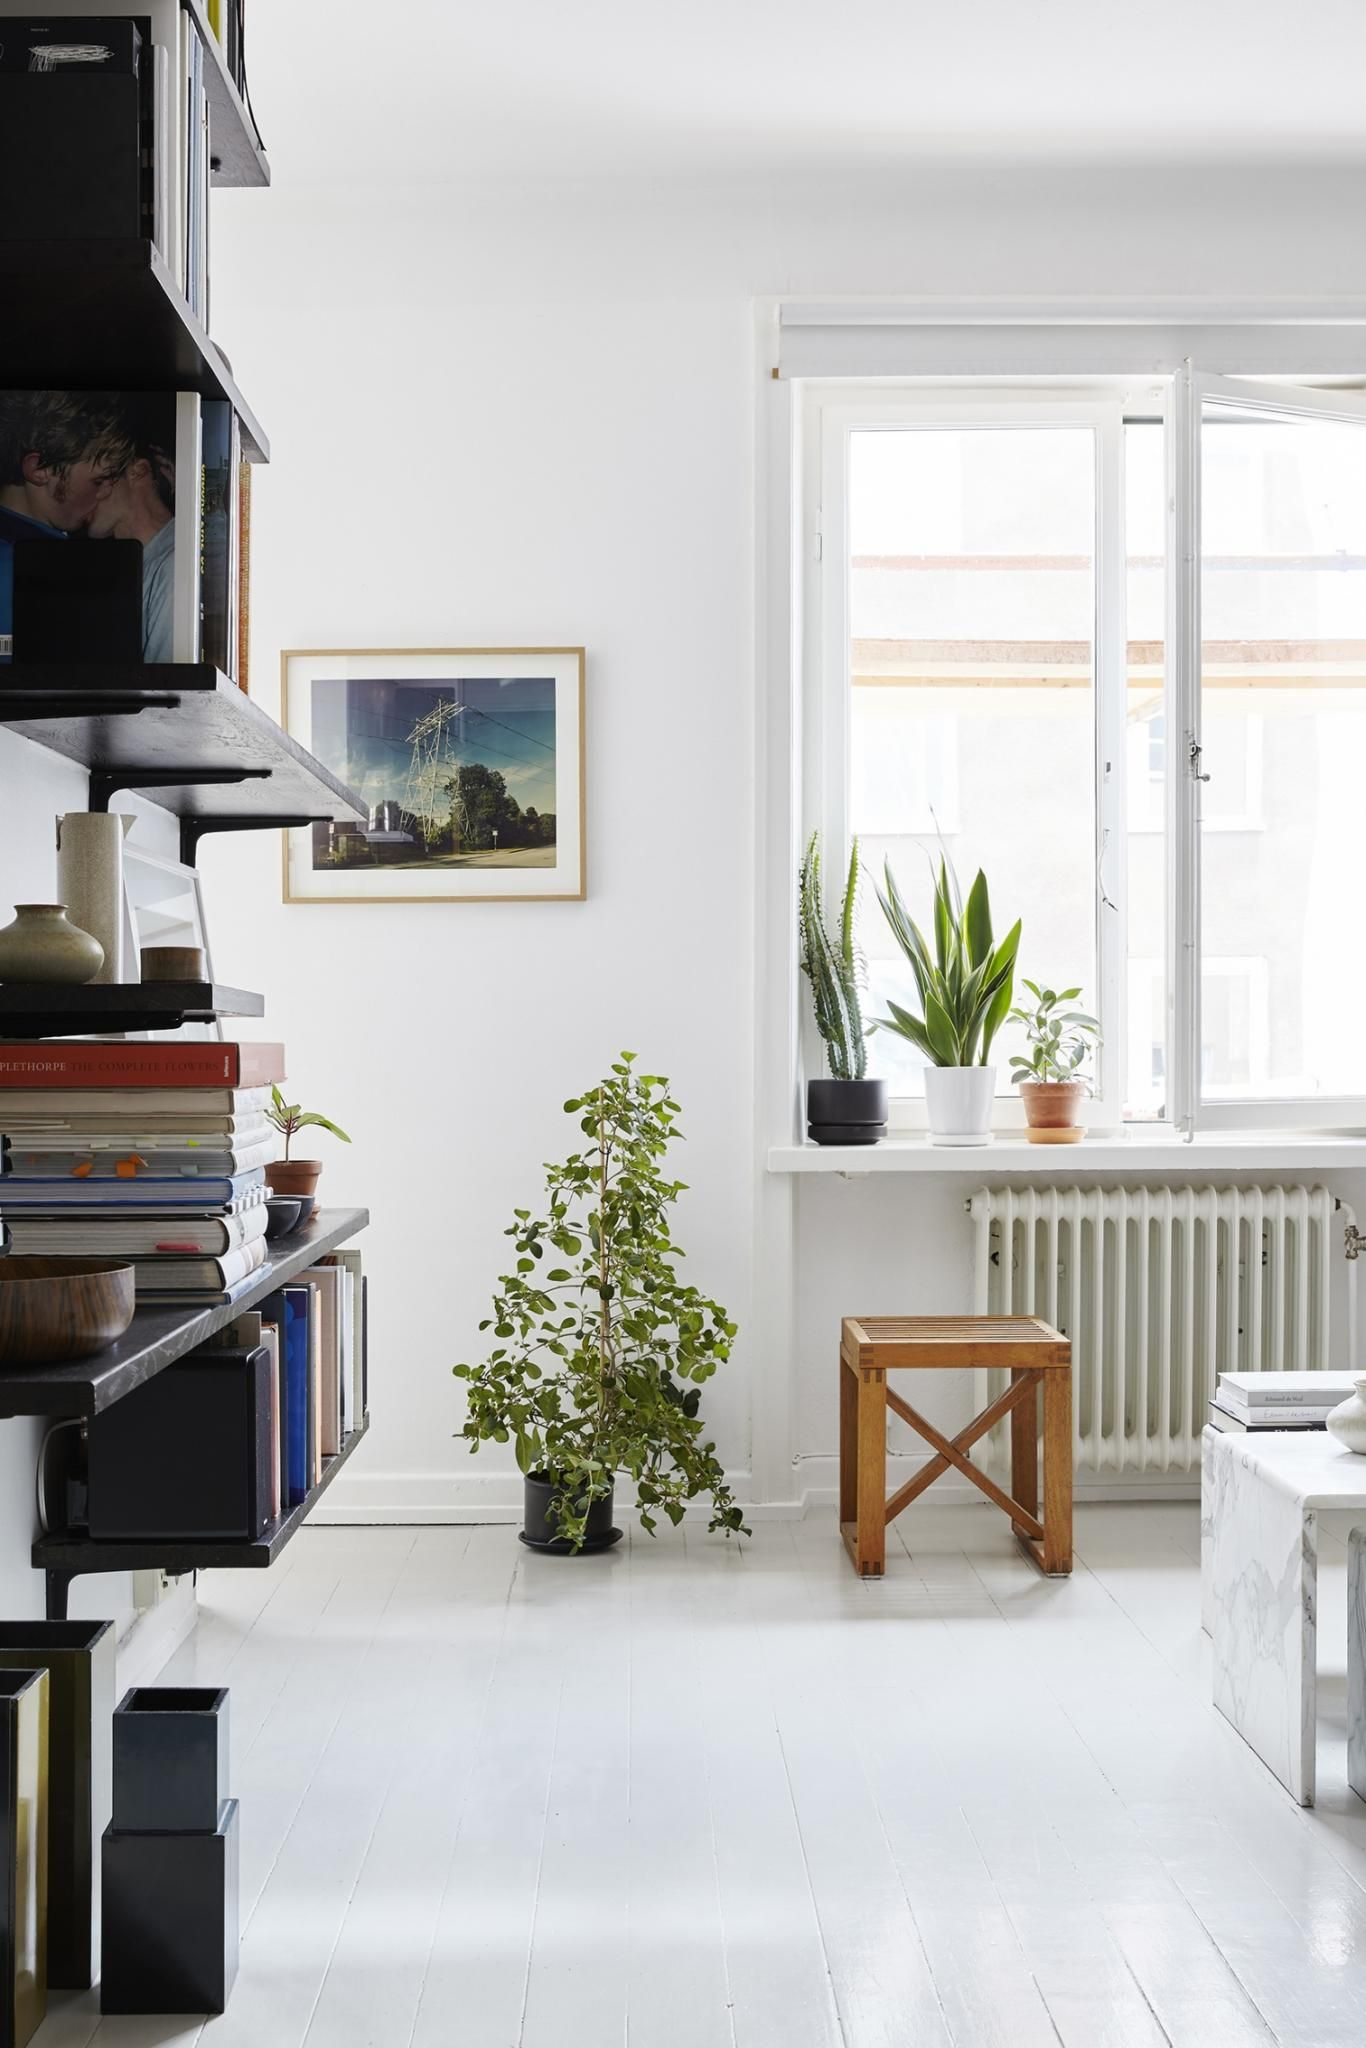 Ploggatan fantastic frank real estate scandinavia interior design stylist stockholm also summer house rh pinterest